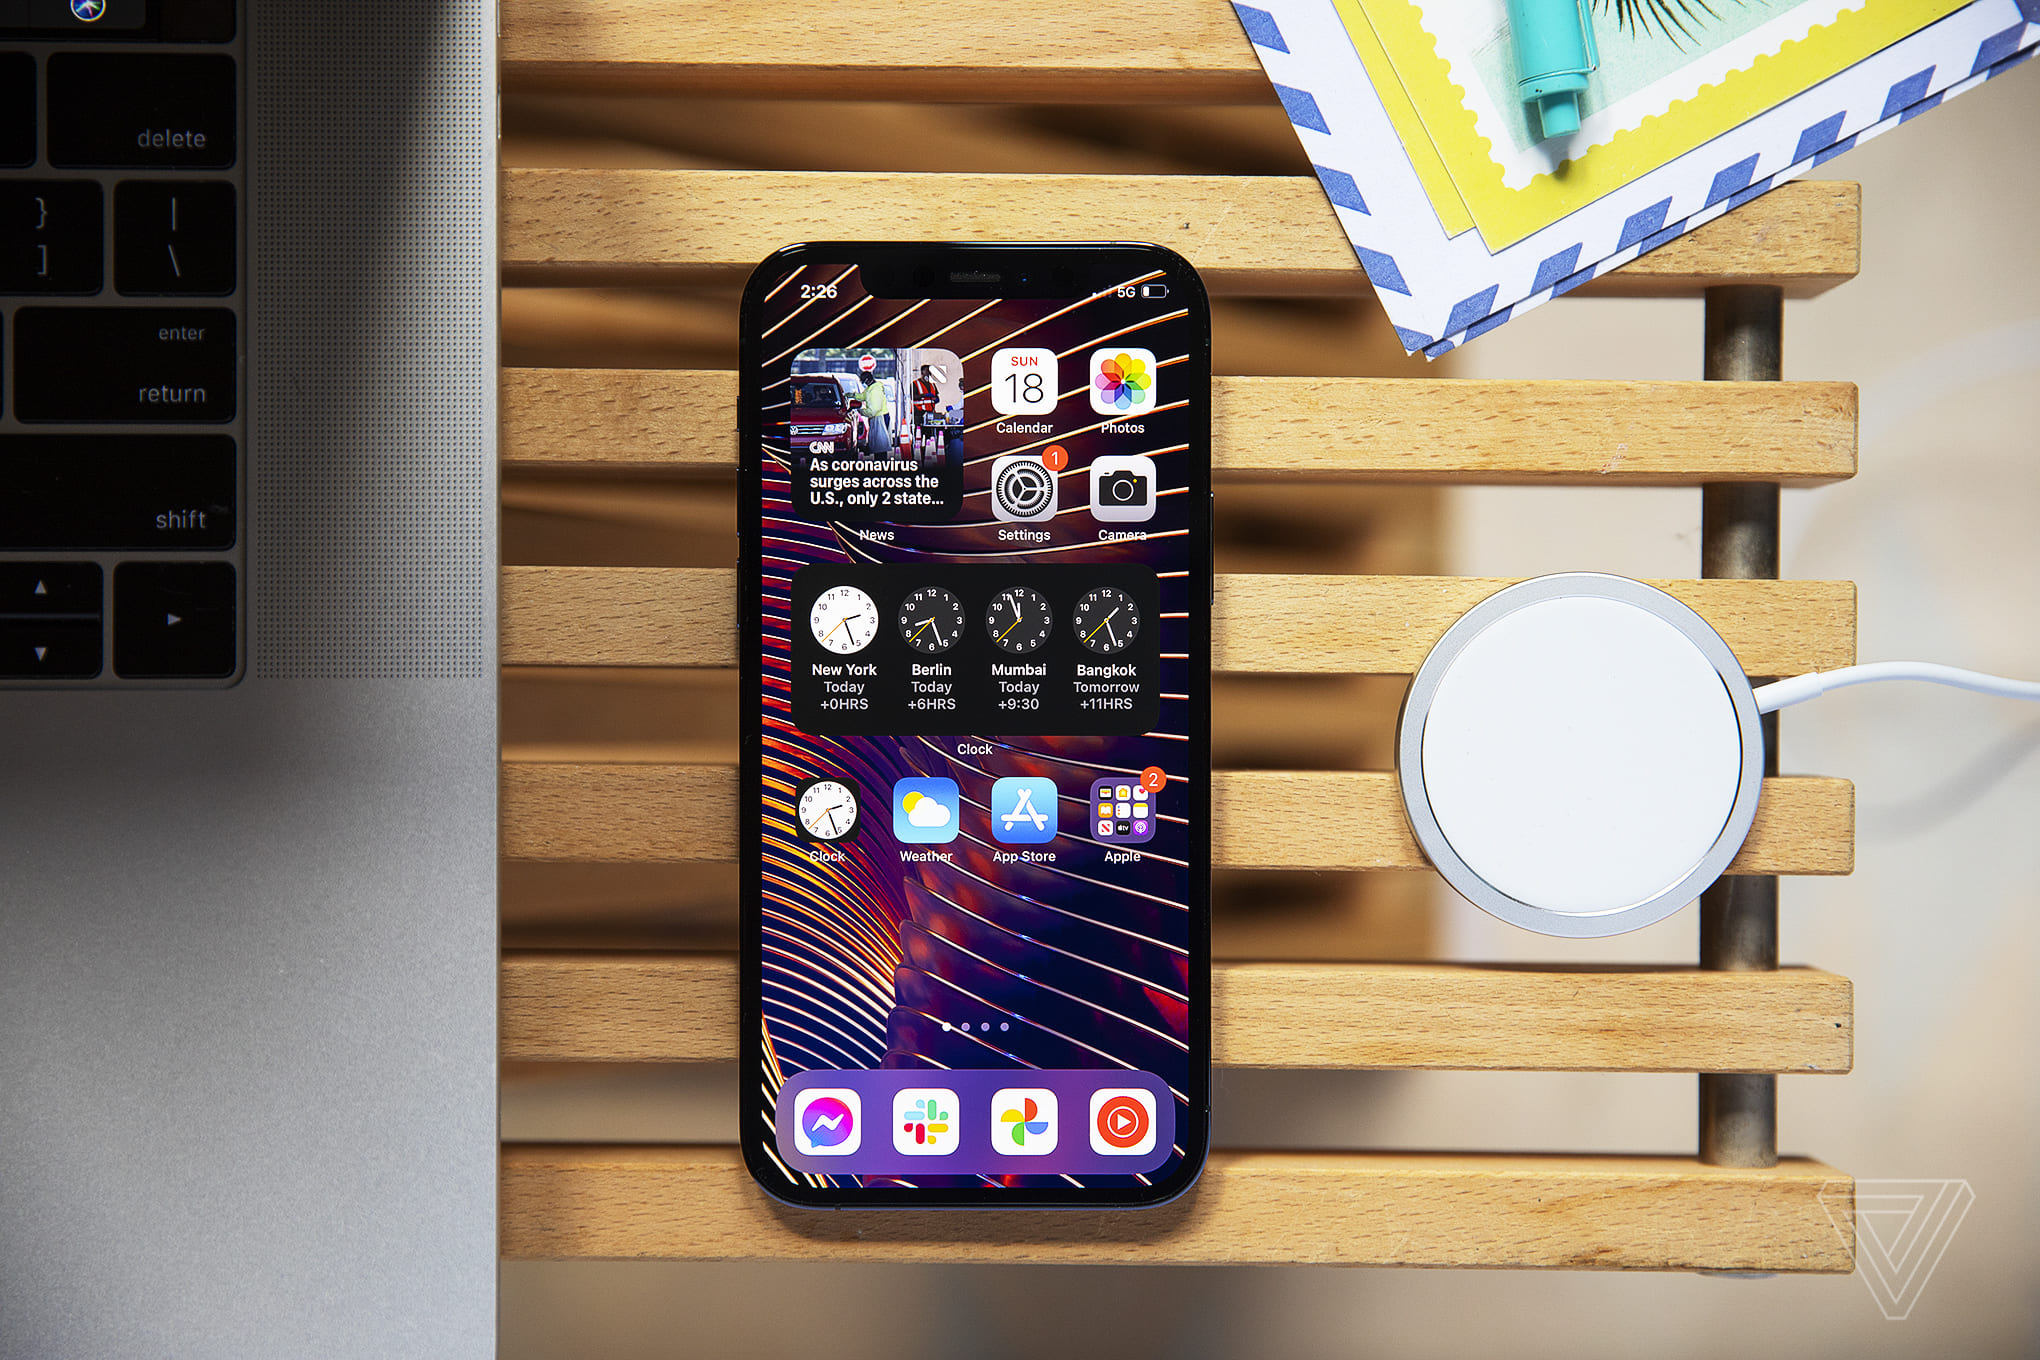 Đánh giá iPhone 12 Pro: Chiếc smartphone